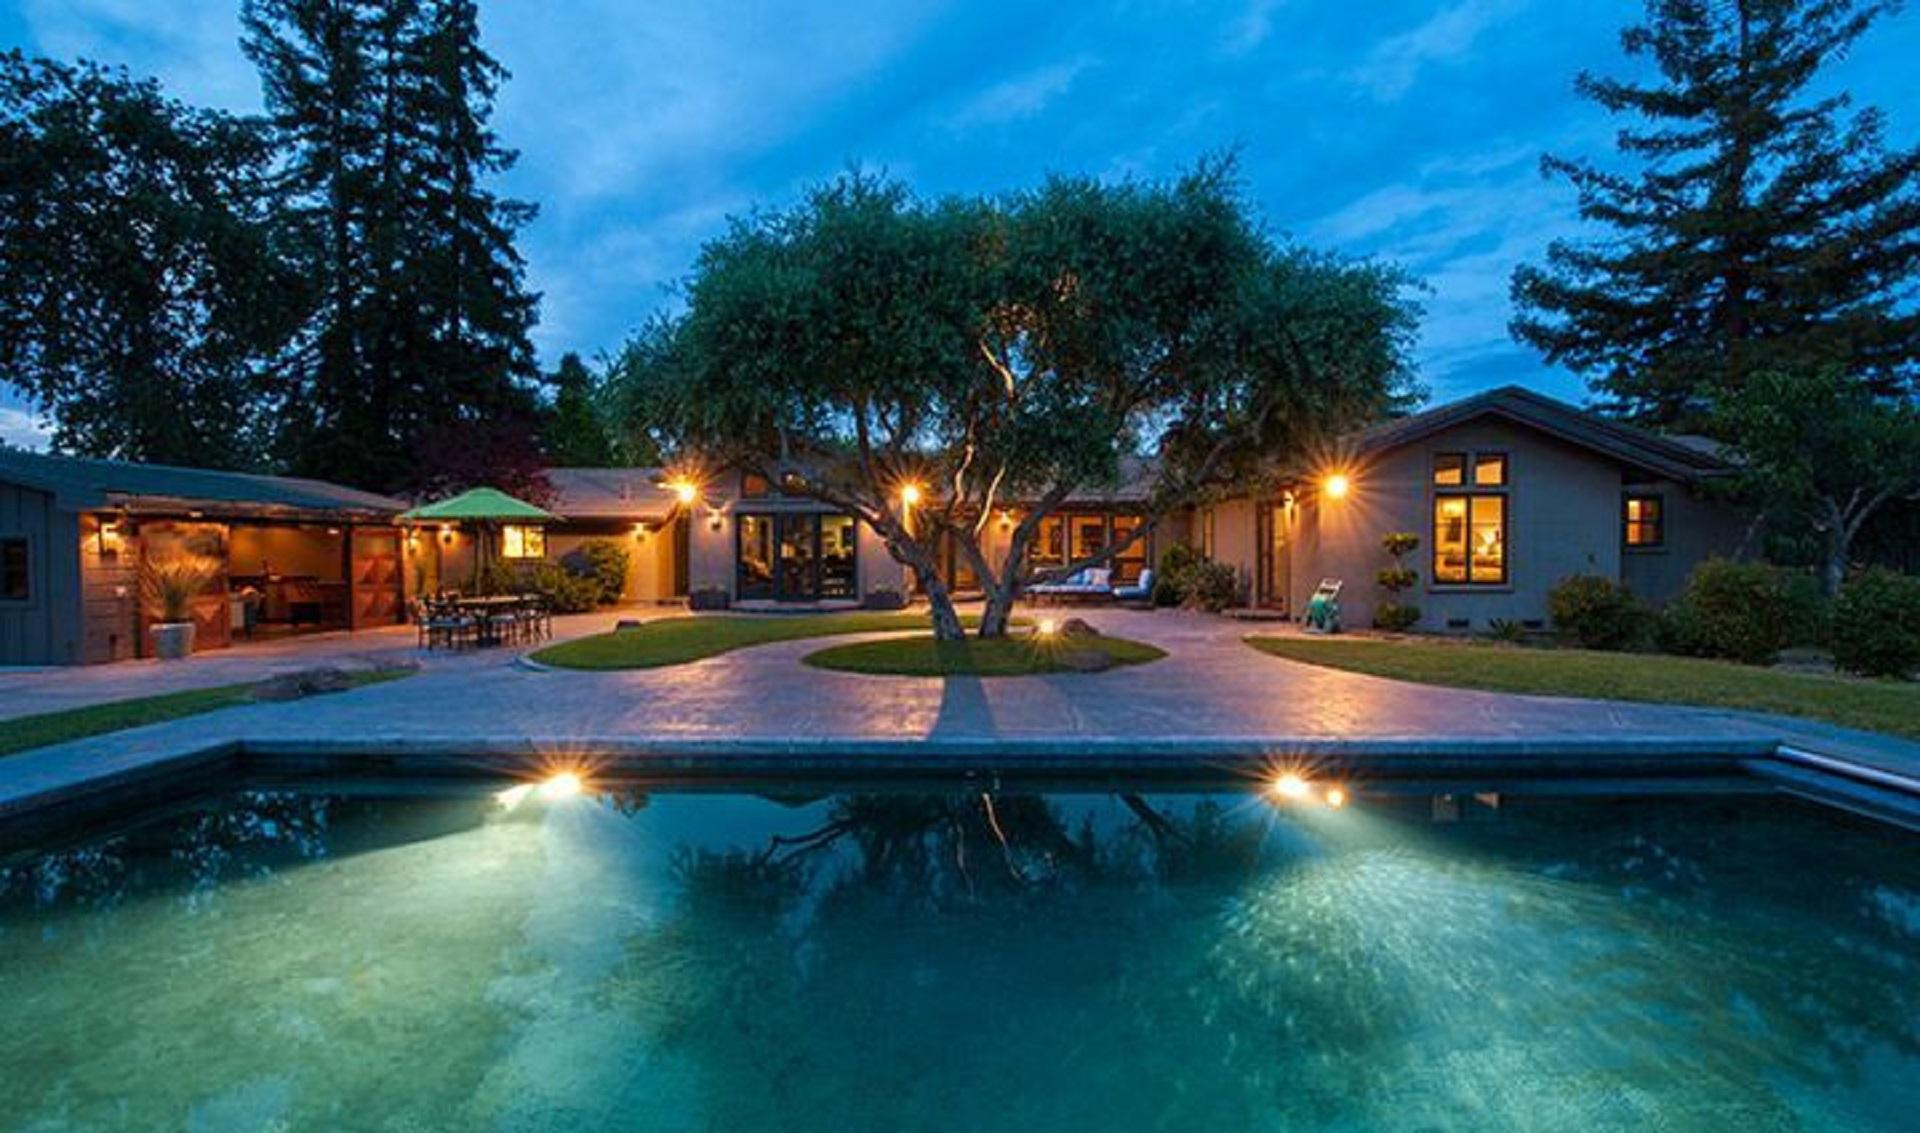 Single Family Home for Sale at Napa Valley Stonehenge 1321 Davis Street St. Helena, California, 94574 United States